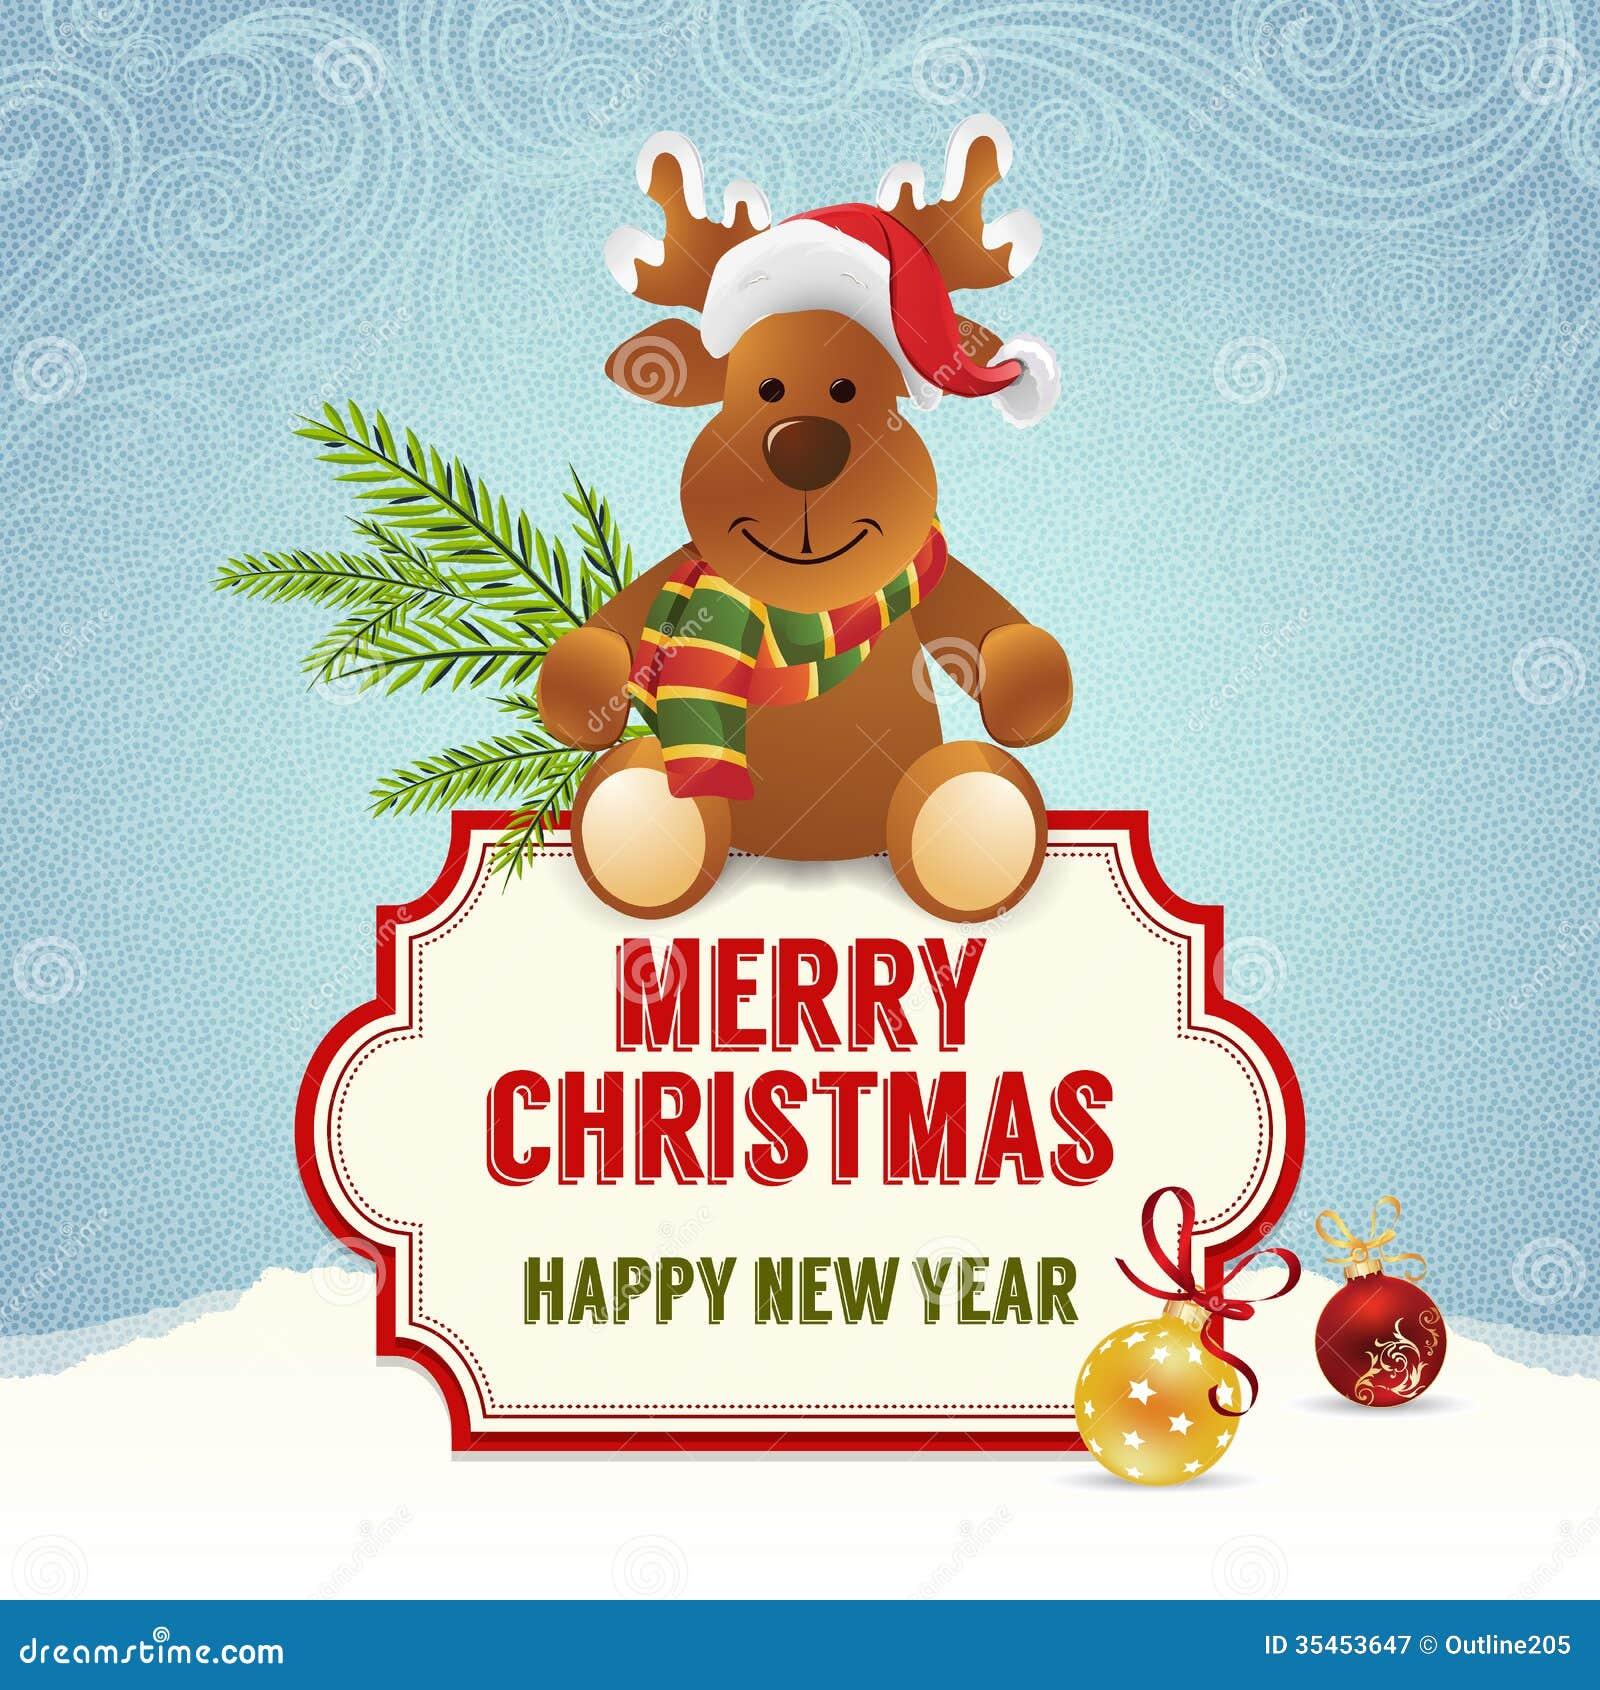 Christmas card stock illustration. Illustration of flakes - 35453647